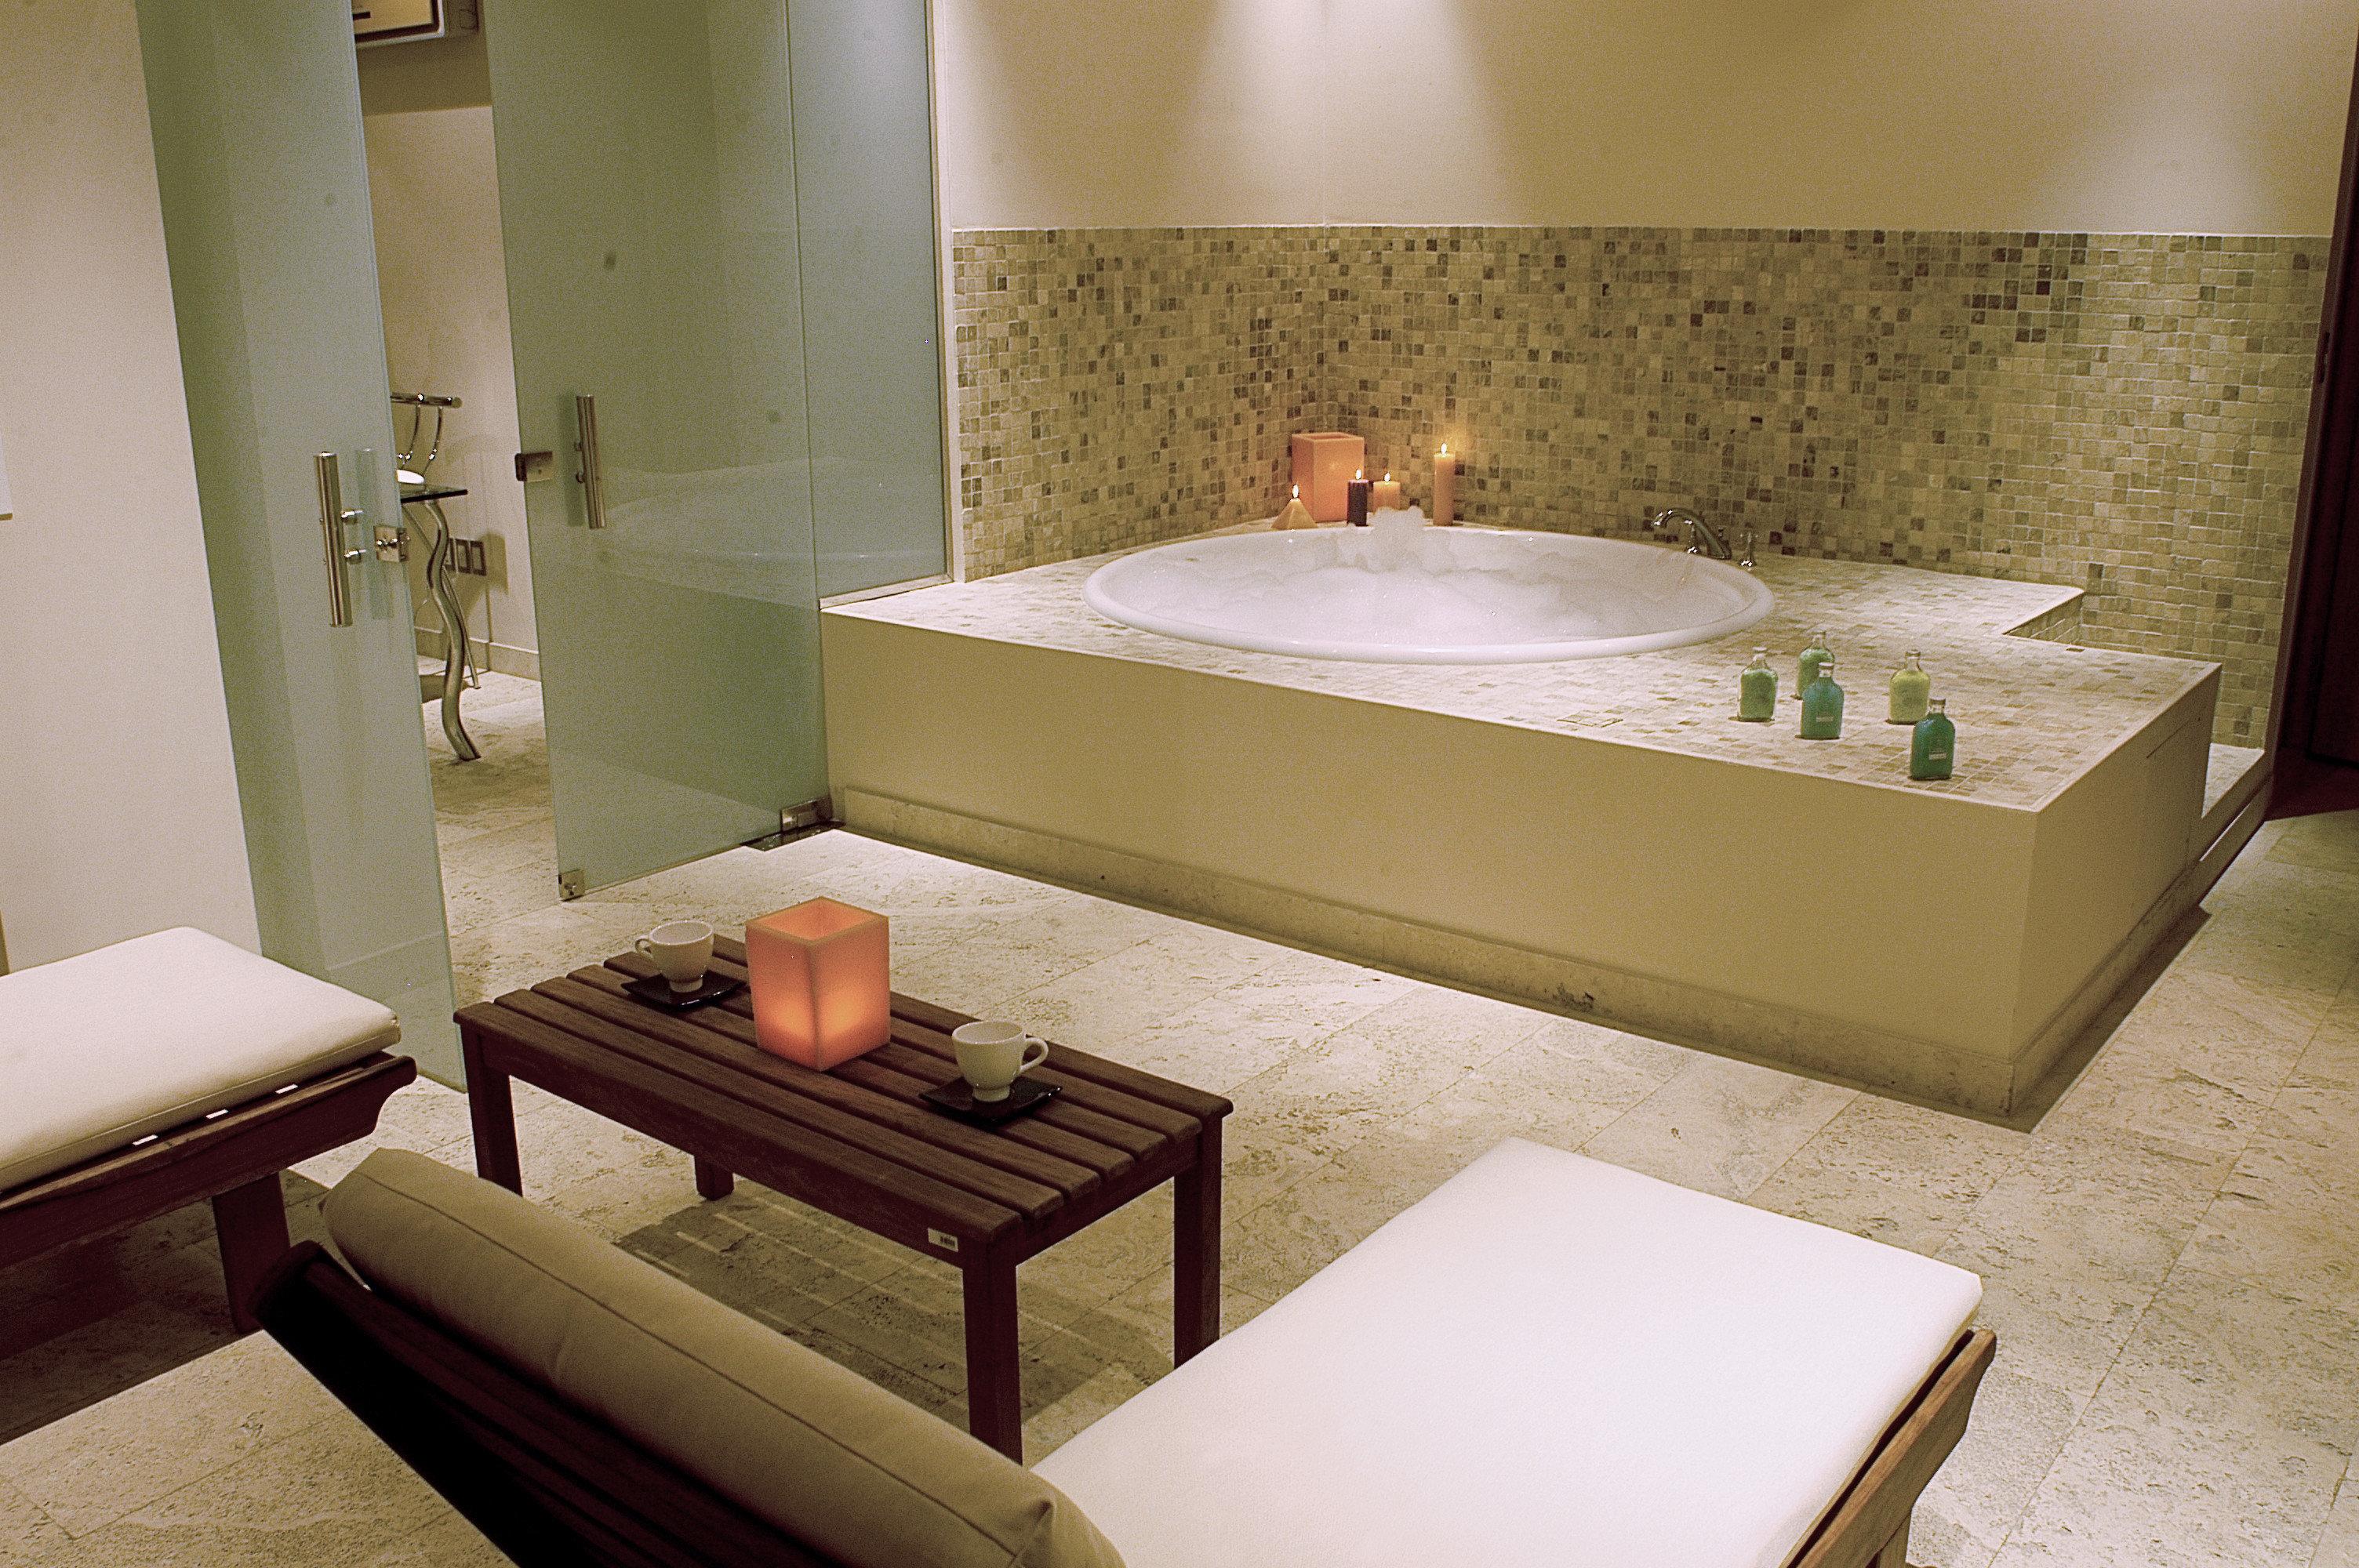 City Classic Cultural Hot tub/Jacuzzi Wellness bathroom mirror sink swimming pool bathtub Suite jacuzzi plumbing fixture colored